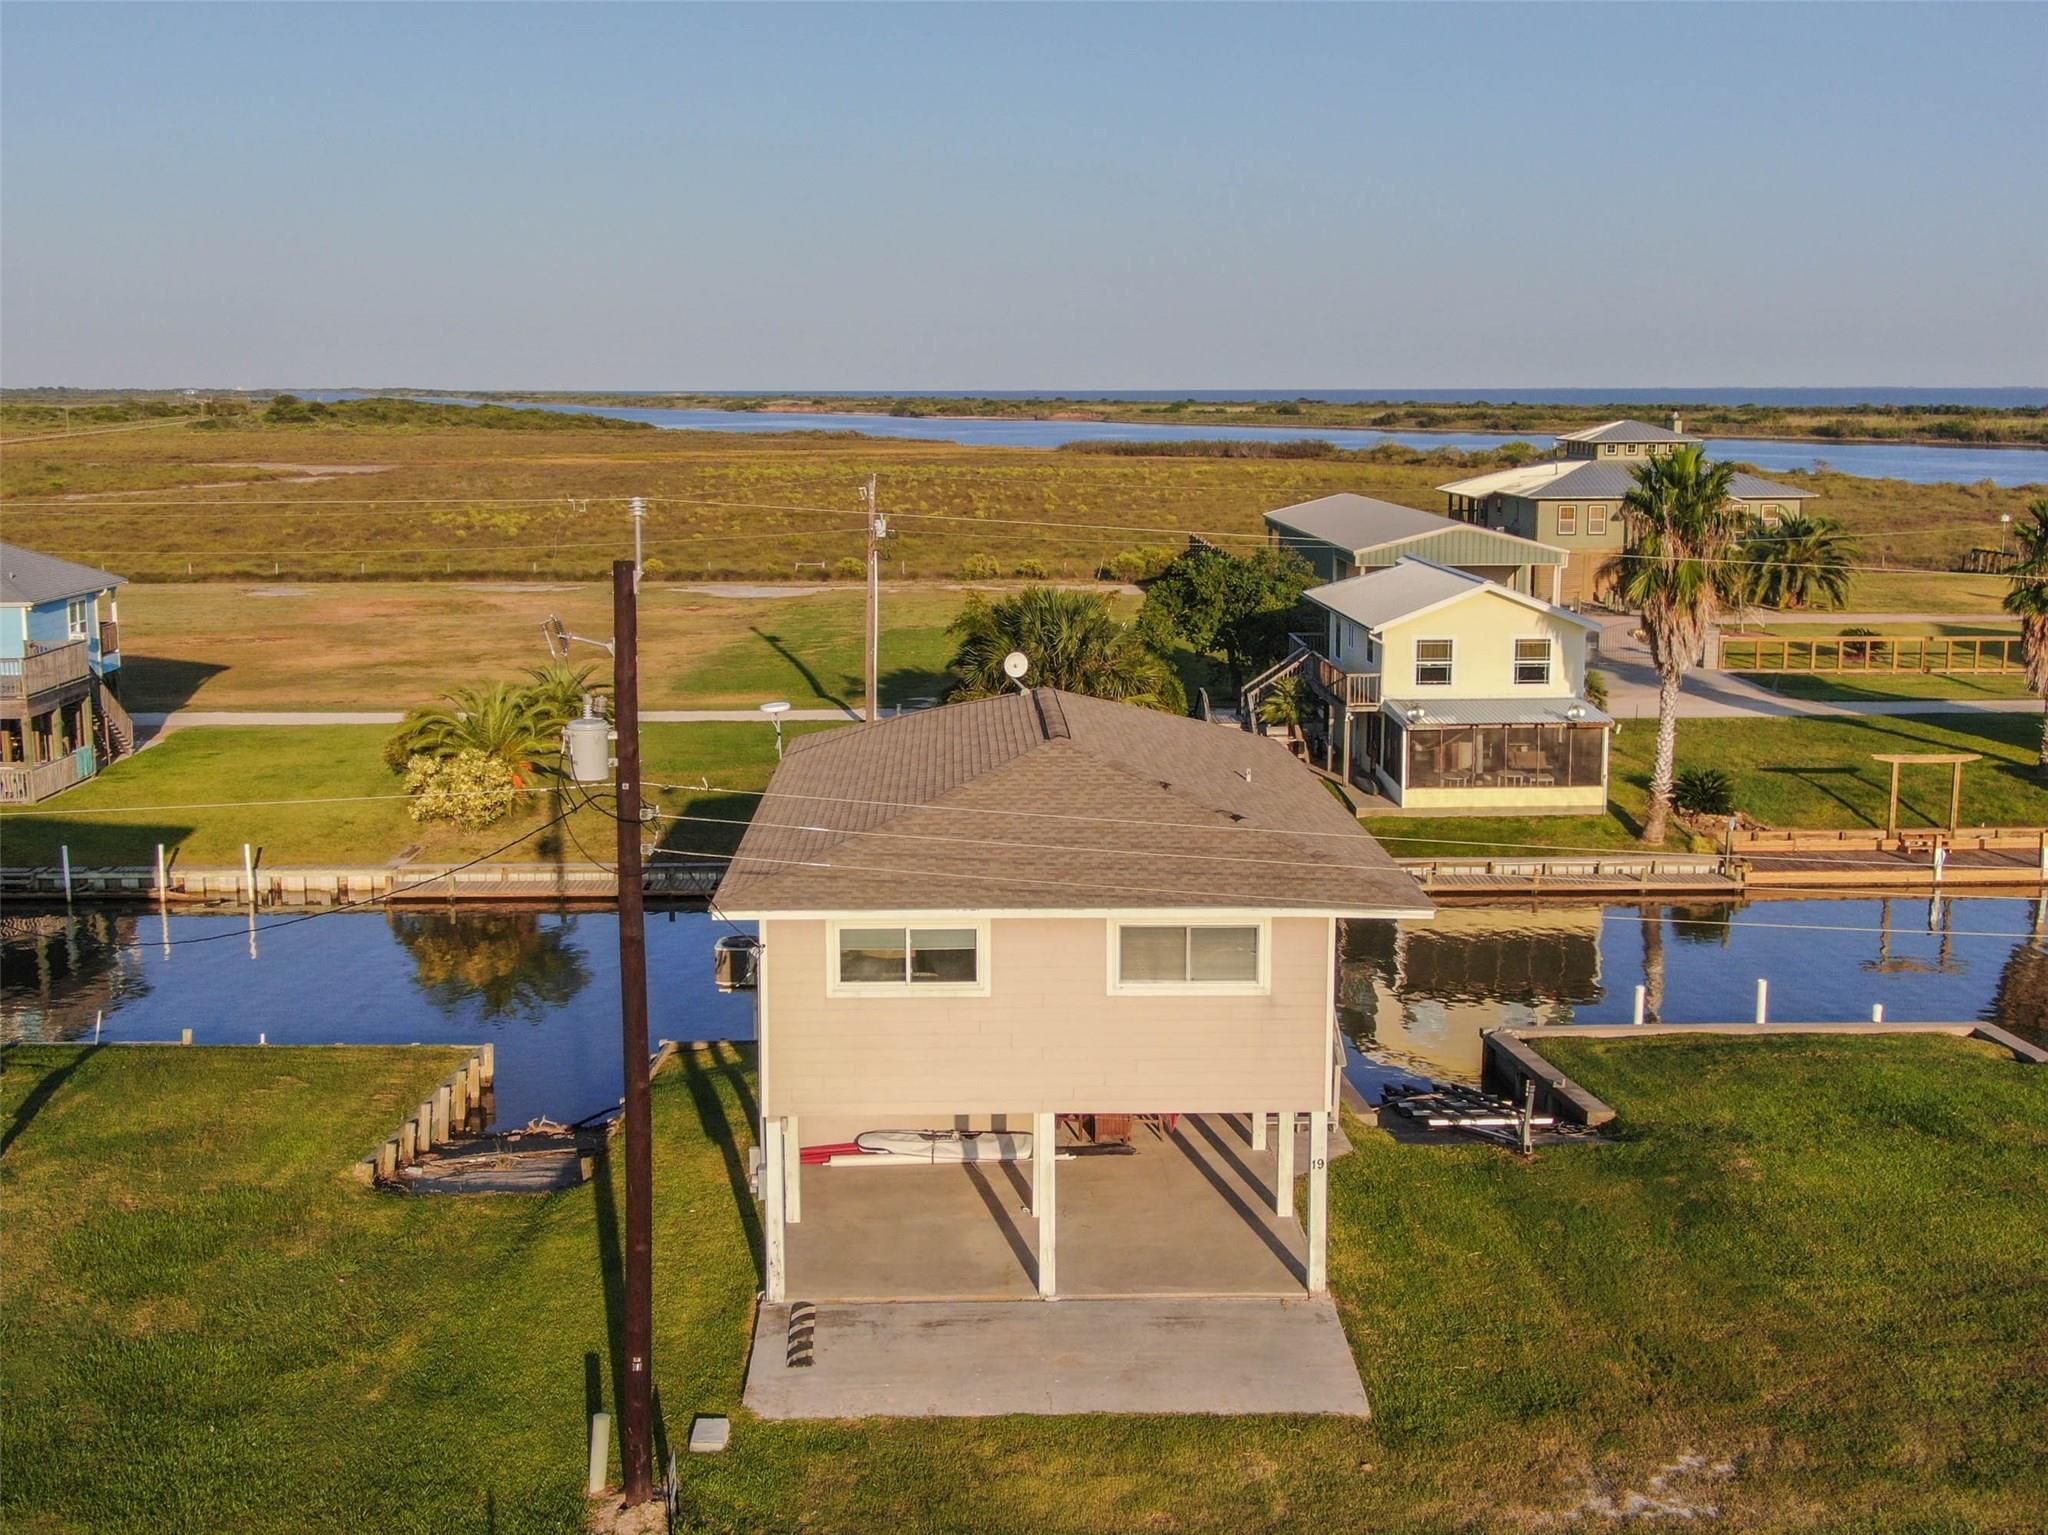 18 Private Road 642 Property Photo - Matagorda, TX real estate listing